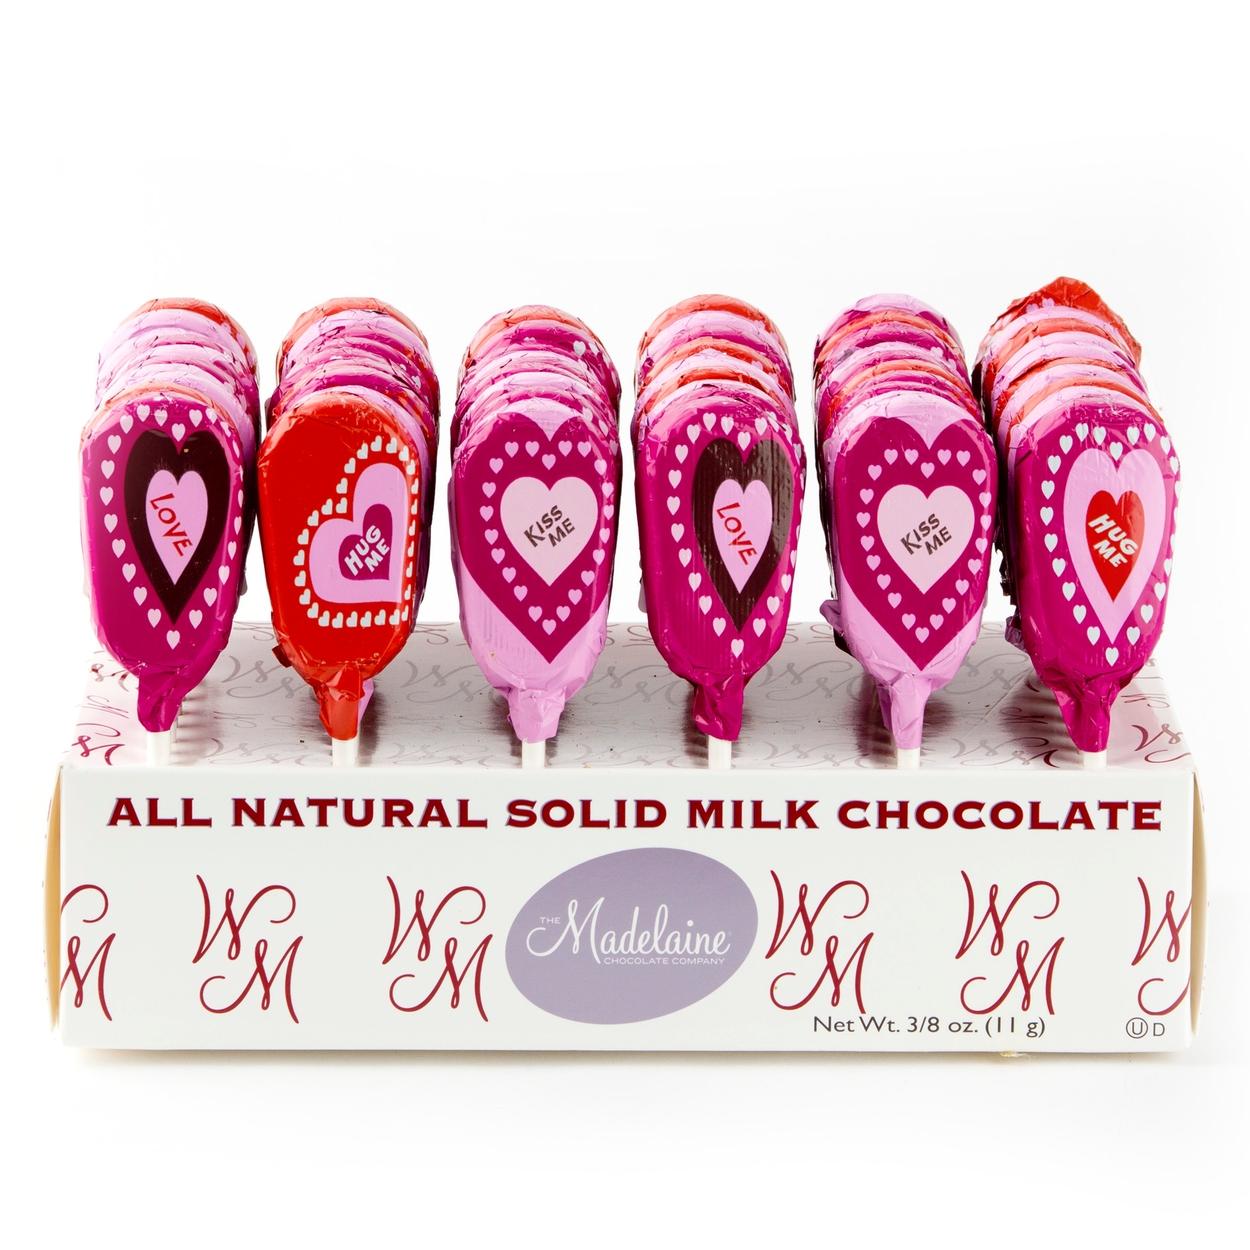 valentine heart milk chocolate lollipops 36ct display box valentine candy chocolate valentines day gifts oh nuts - Valentine Lollipops